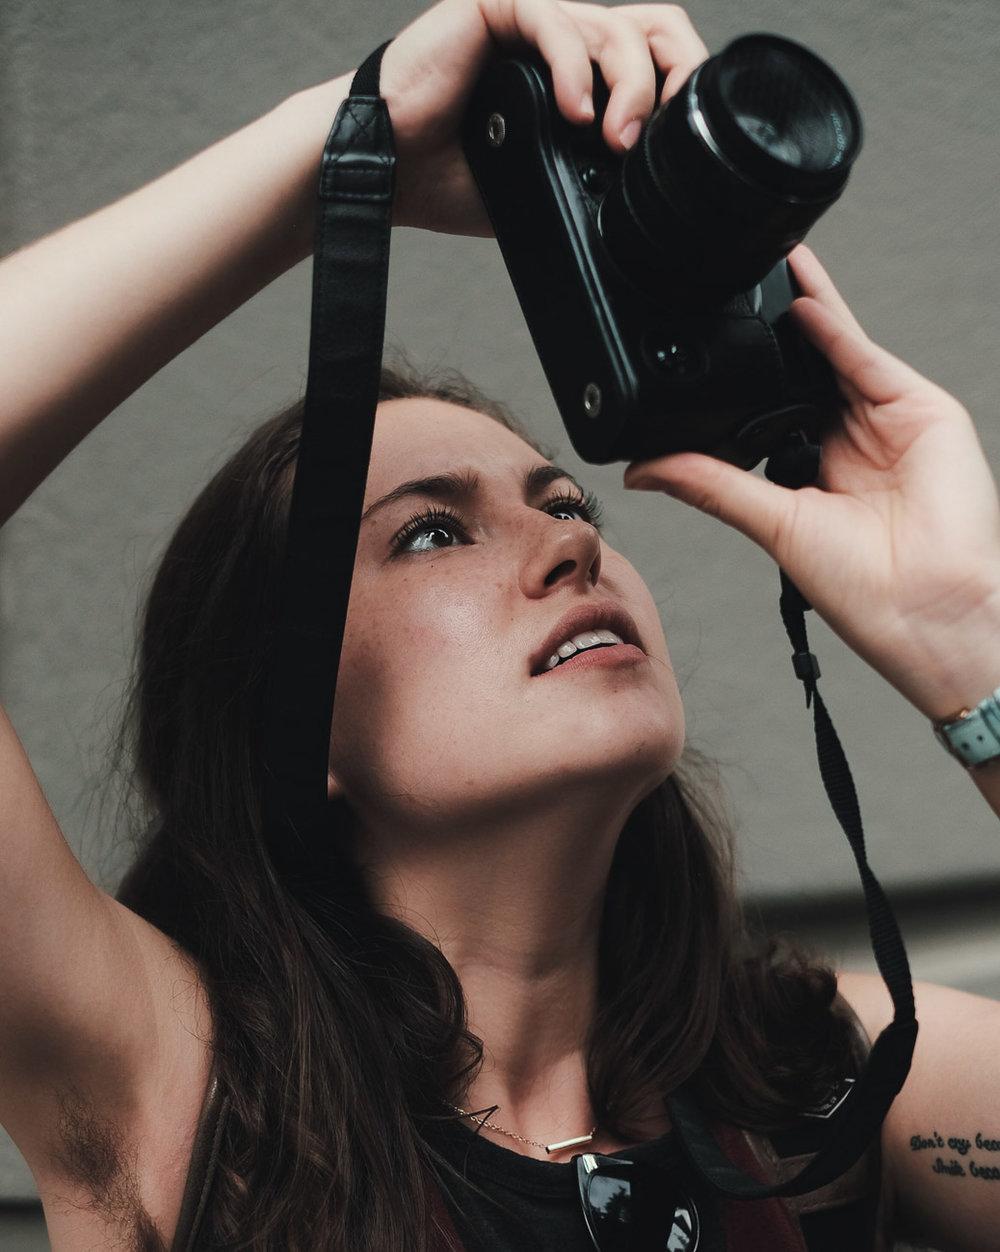 Nicole shooting Fuji. Fuji X-Pro 2, Fuji 35mm f/1.4